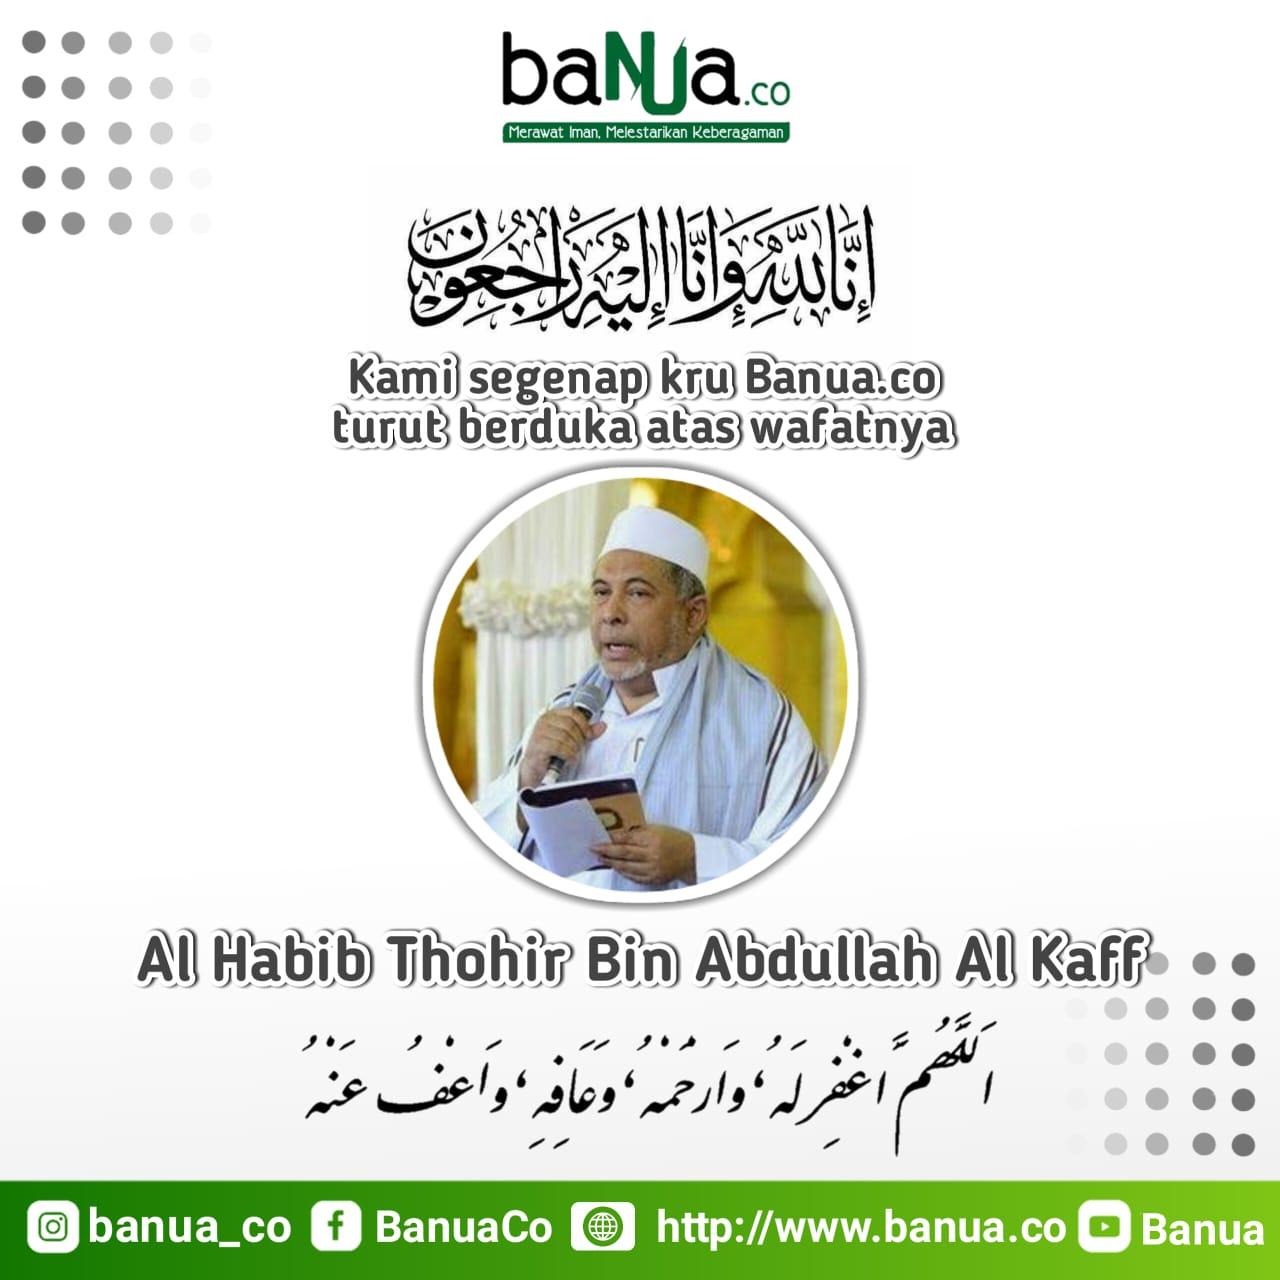 IMG 20201204 WA0003 - Makna Jihad Menurut Habib Thohir Al Kaff